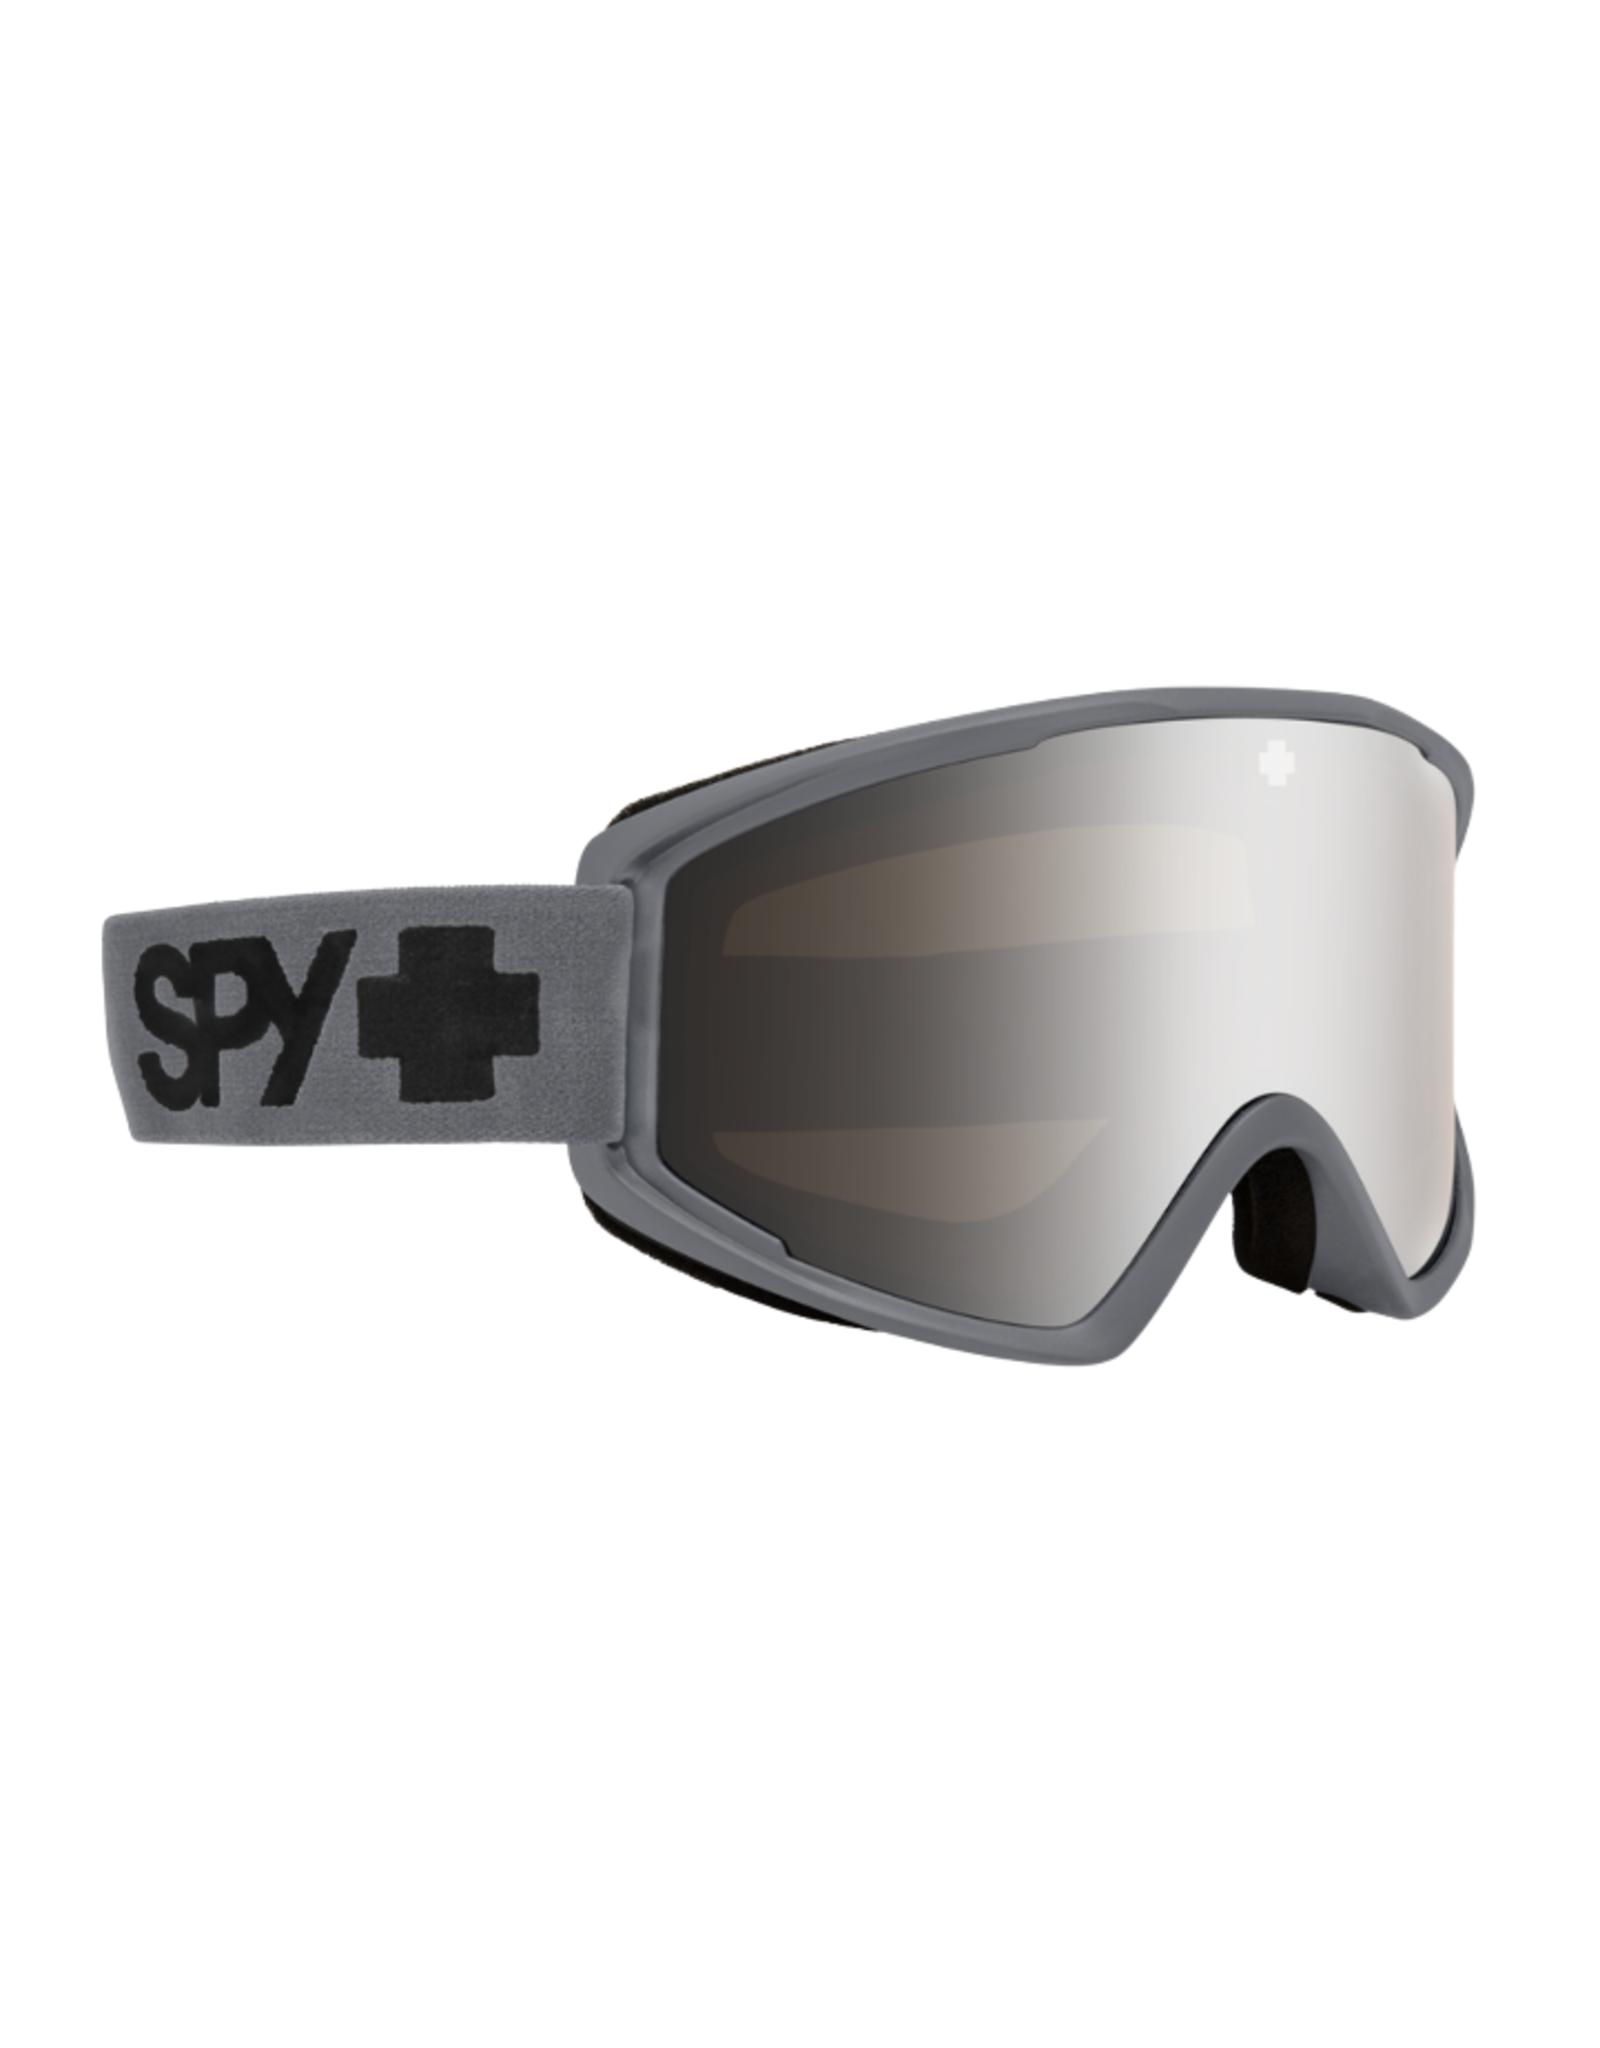 Spy SPY Crusher Elite Matte Gray - HD Bronze w/ Silver Spectra Mirror